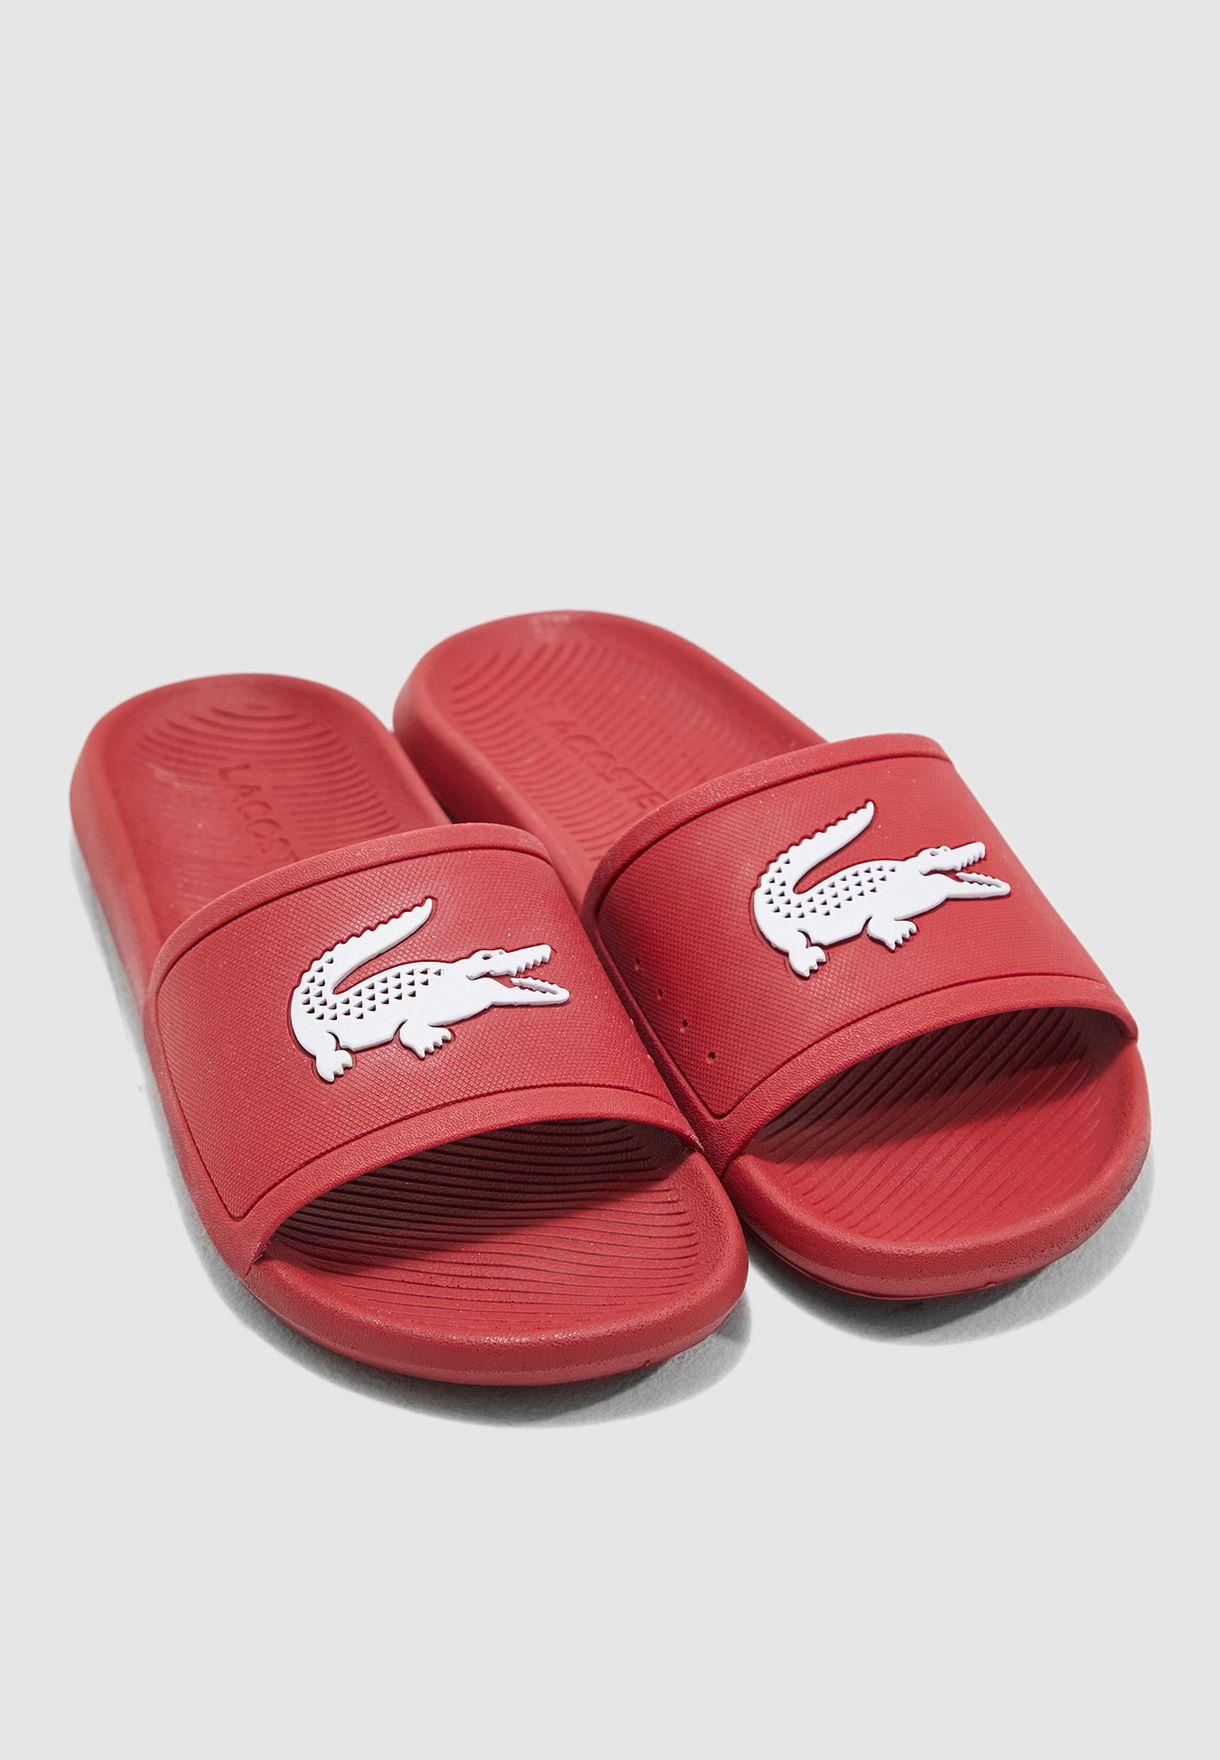 40fbe60455c8 Shop Lacoste red Croco 119 Logo Slides 37CMA0018-17K for Men in UAE -  14008SH54TRP